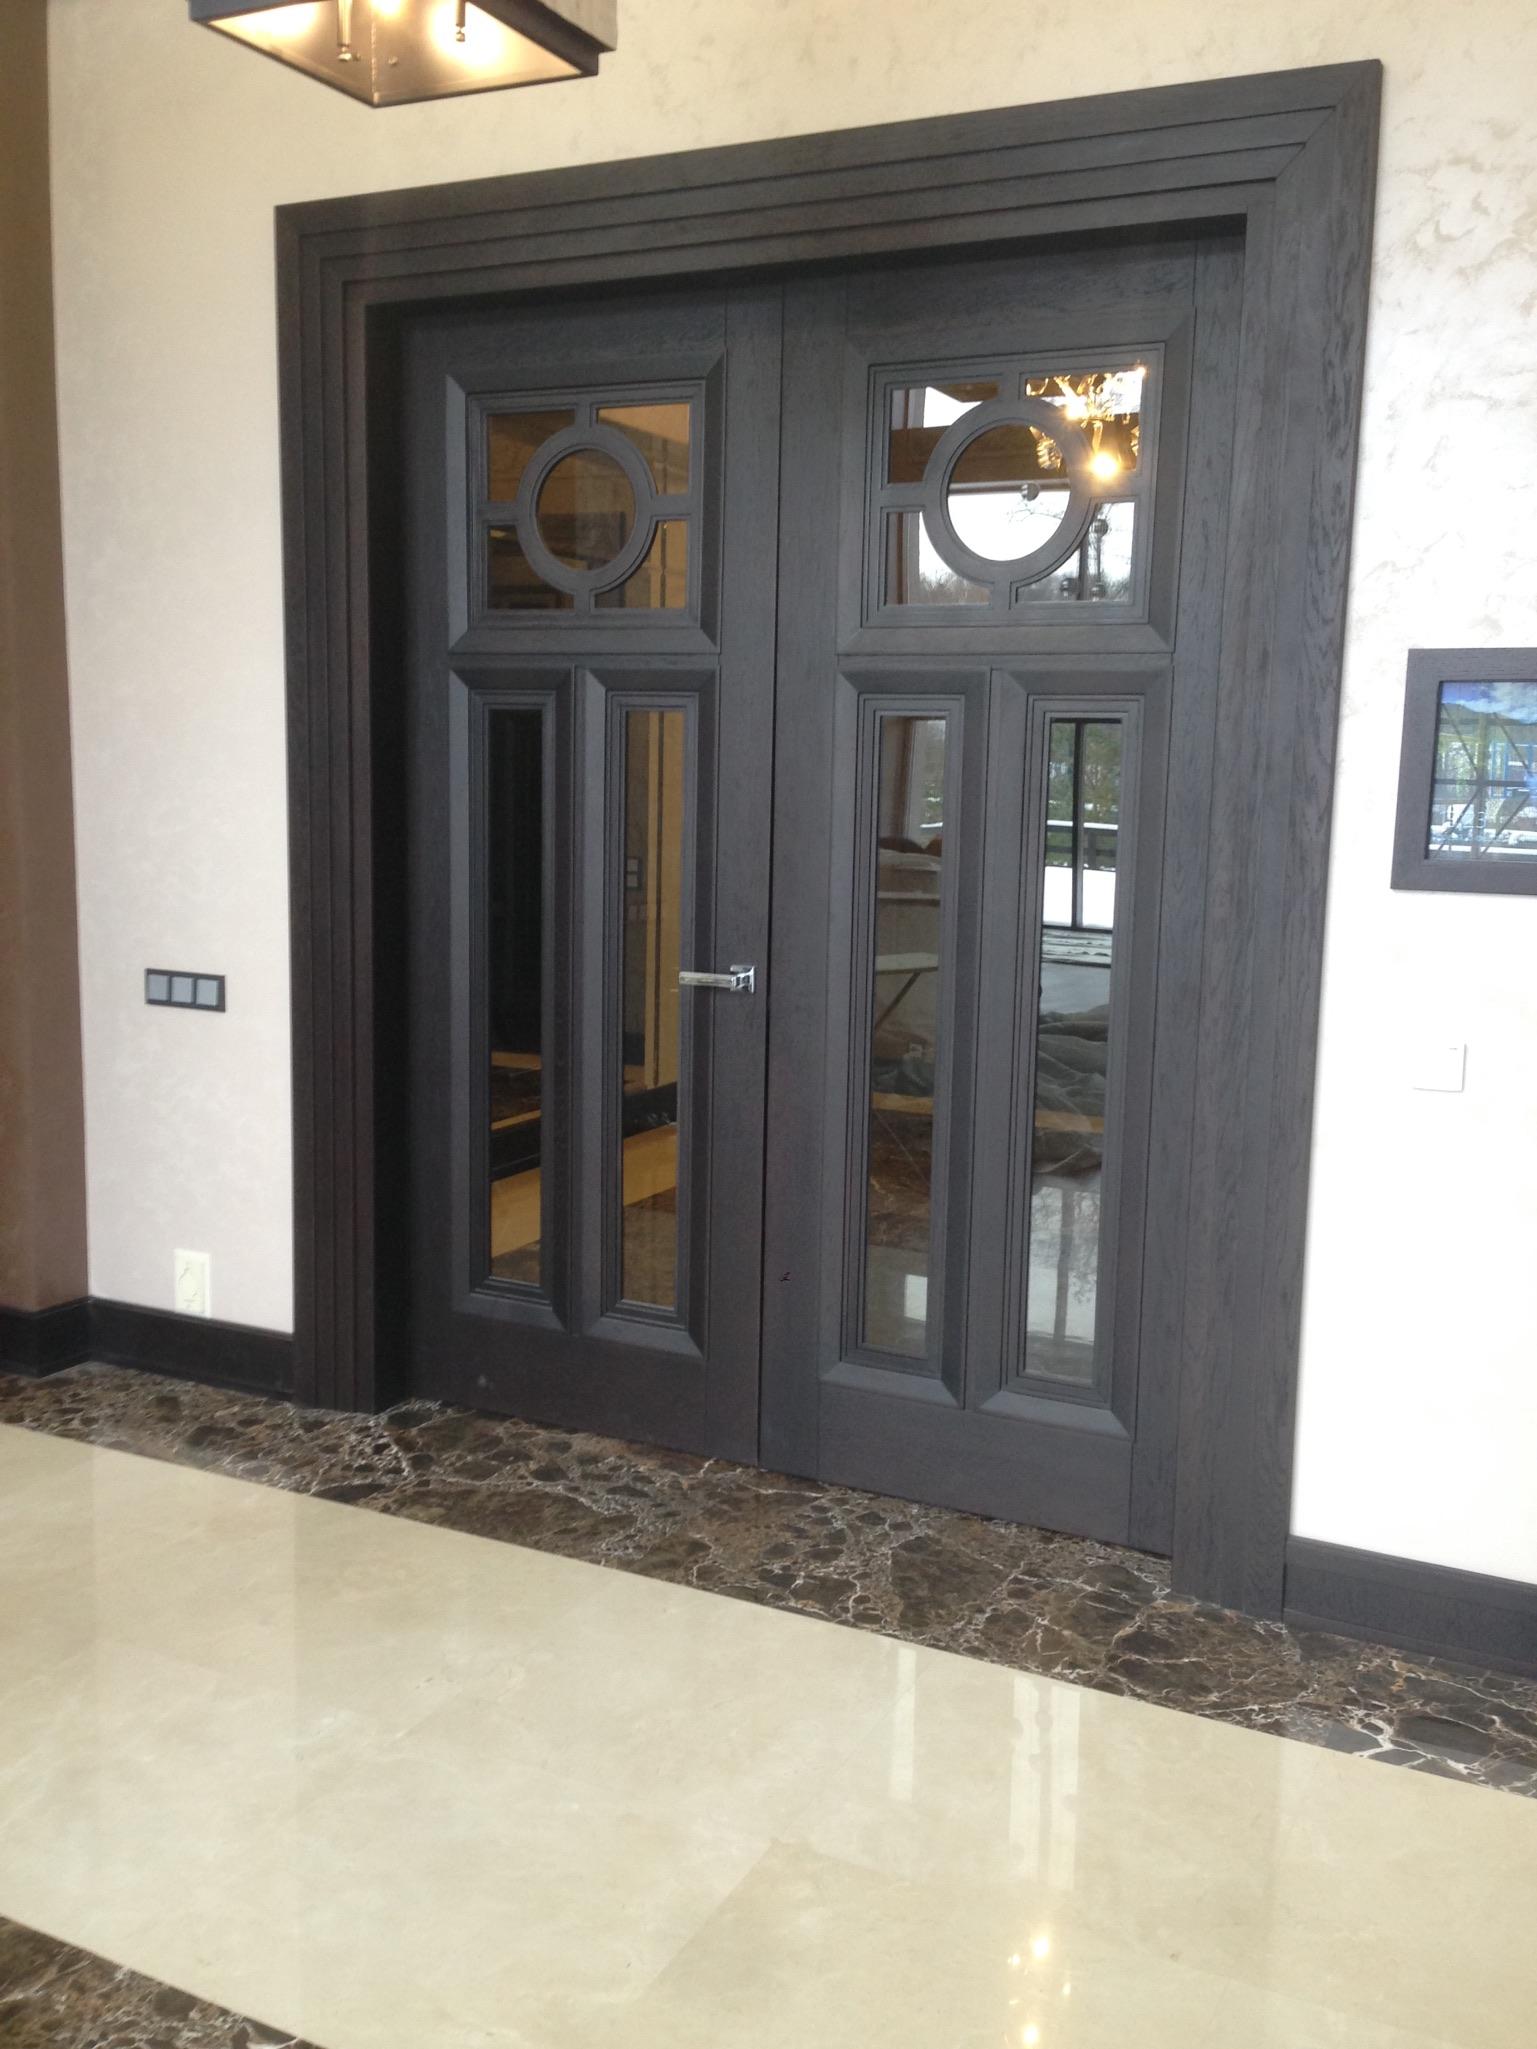 Двери на заказ. Фабрика ARS. Москва